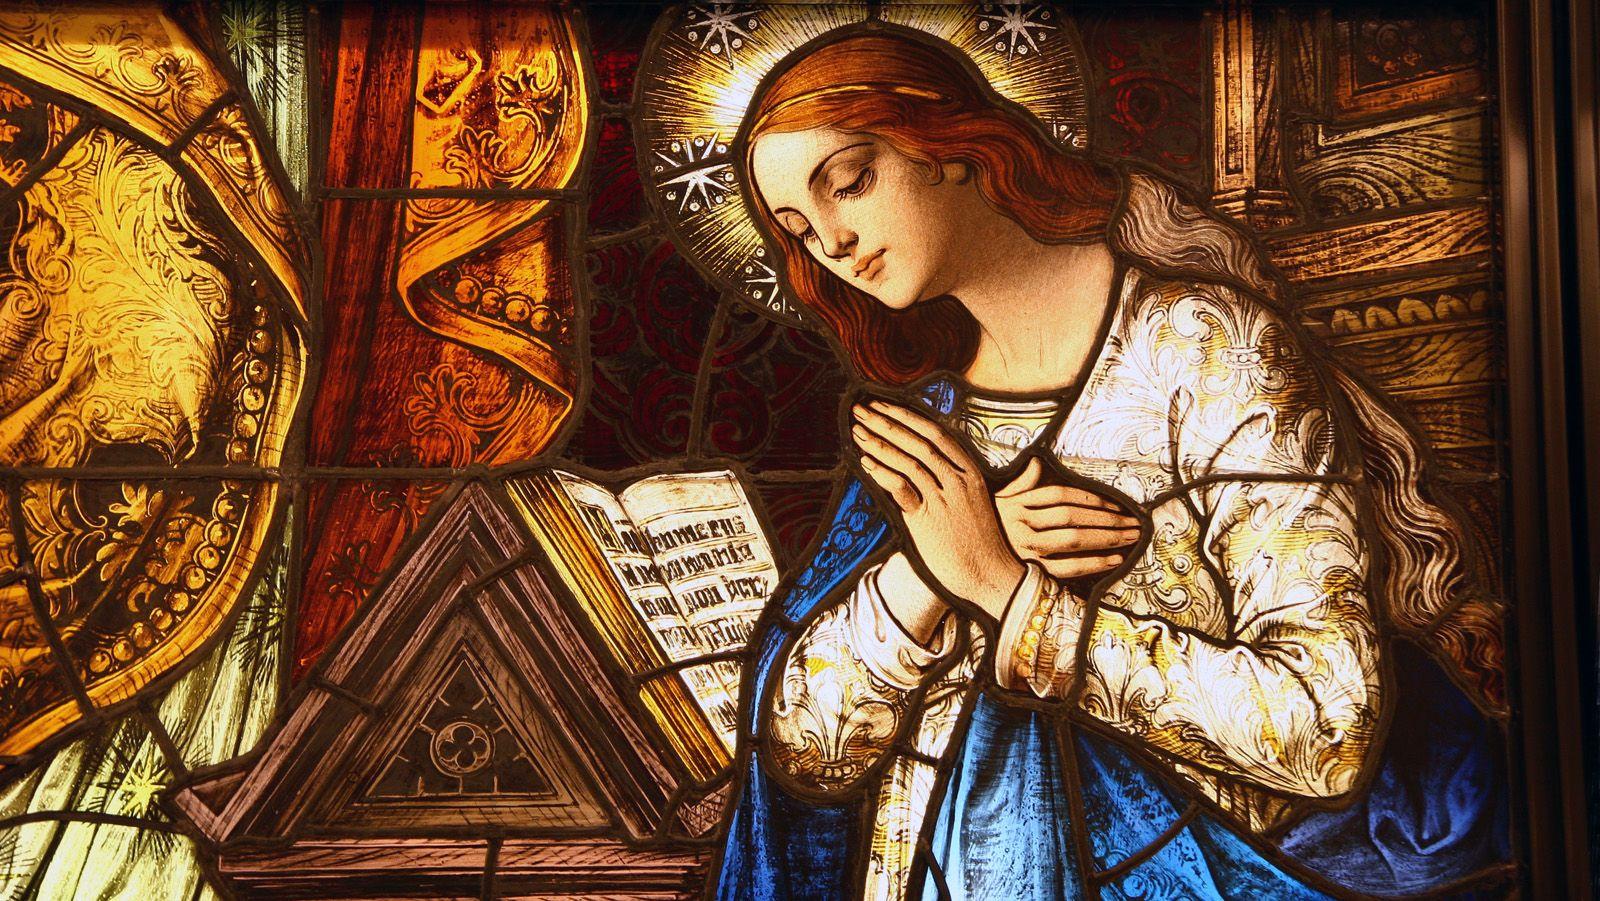 Annunciation | Define Annunciation at Dictionary.com